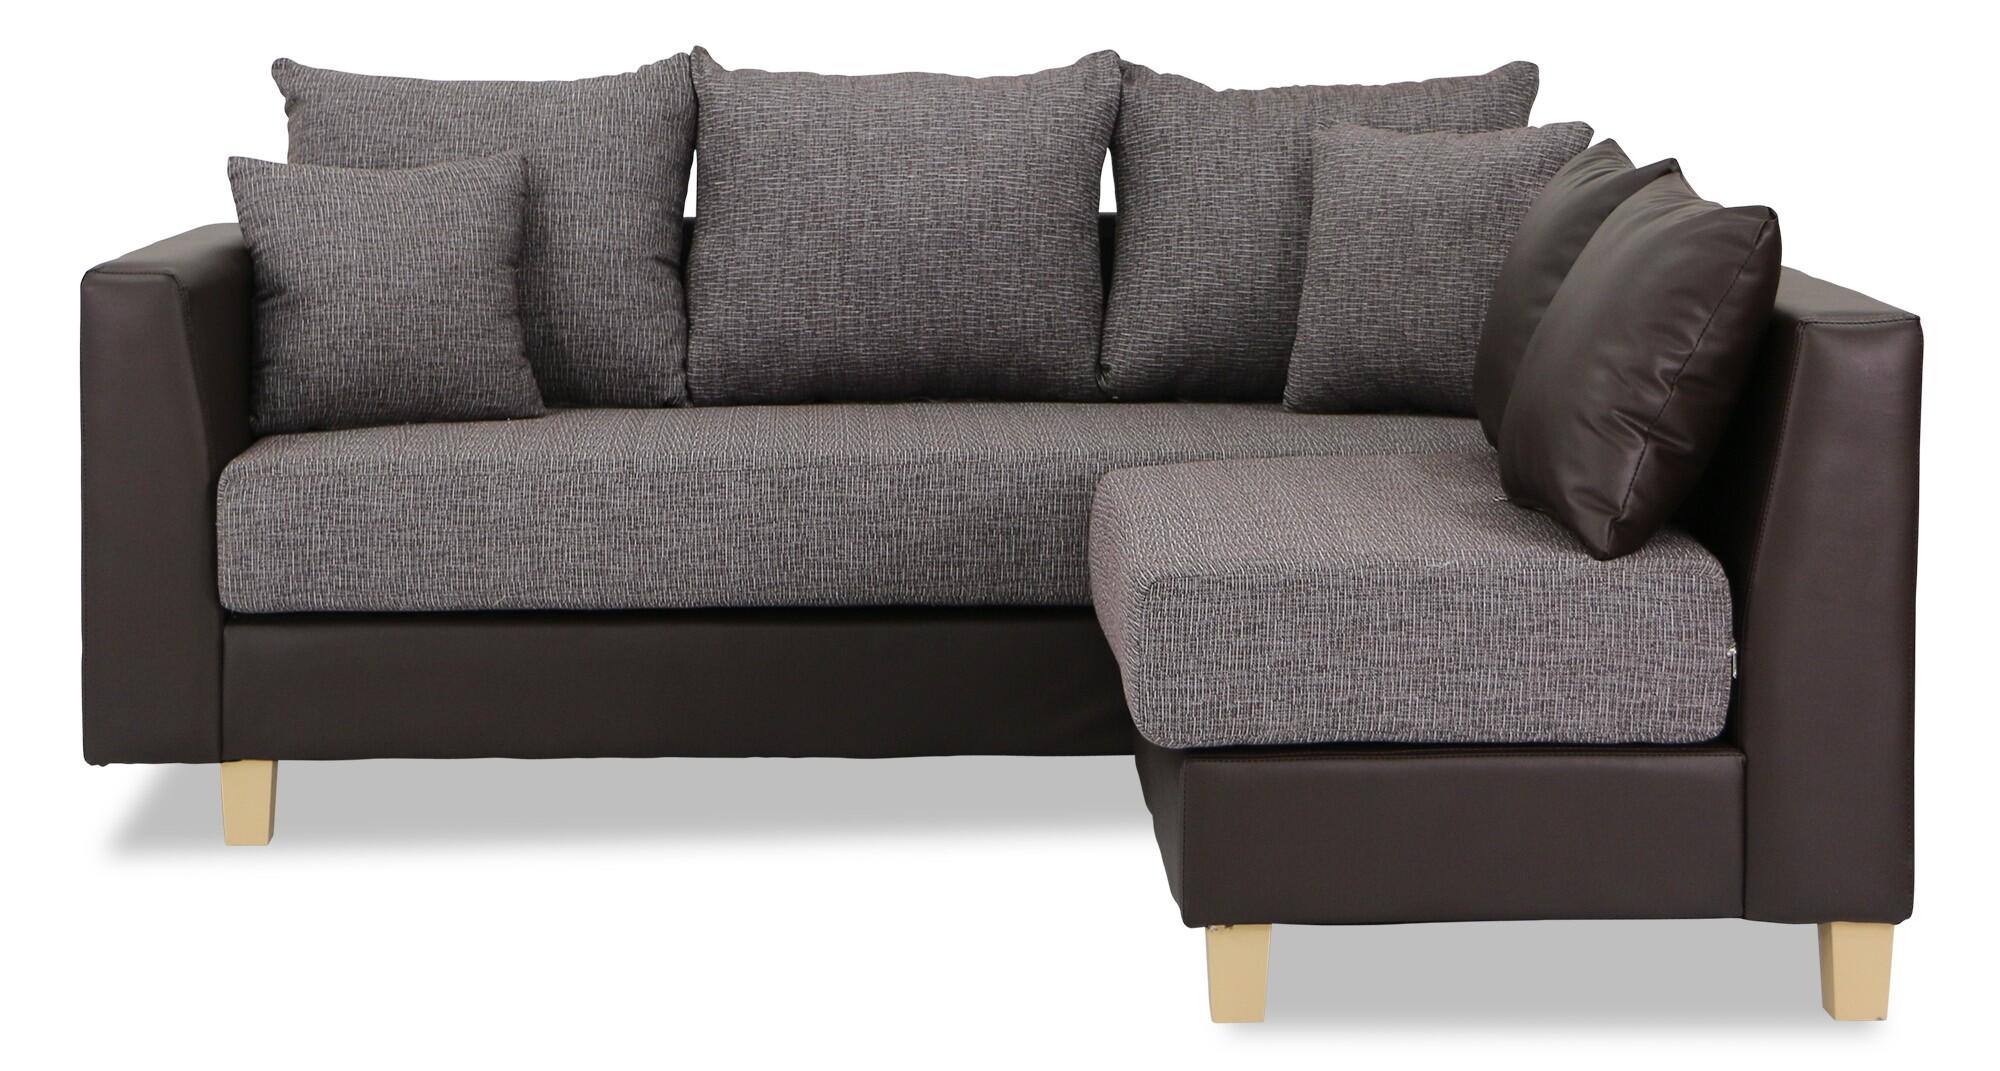 finest selection 4d35f d5d3d Briget Corner Sofa